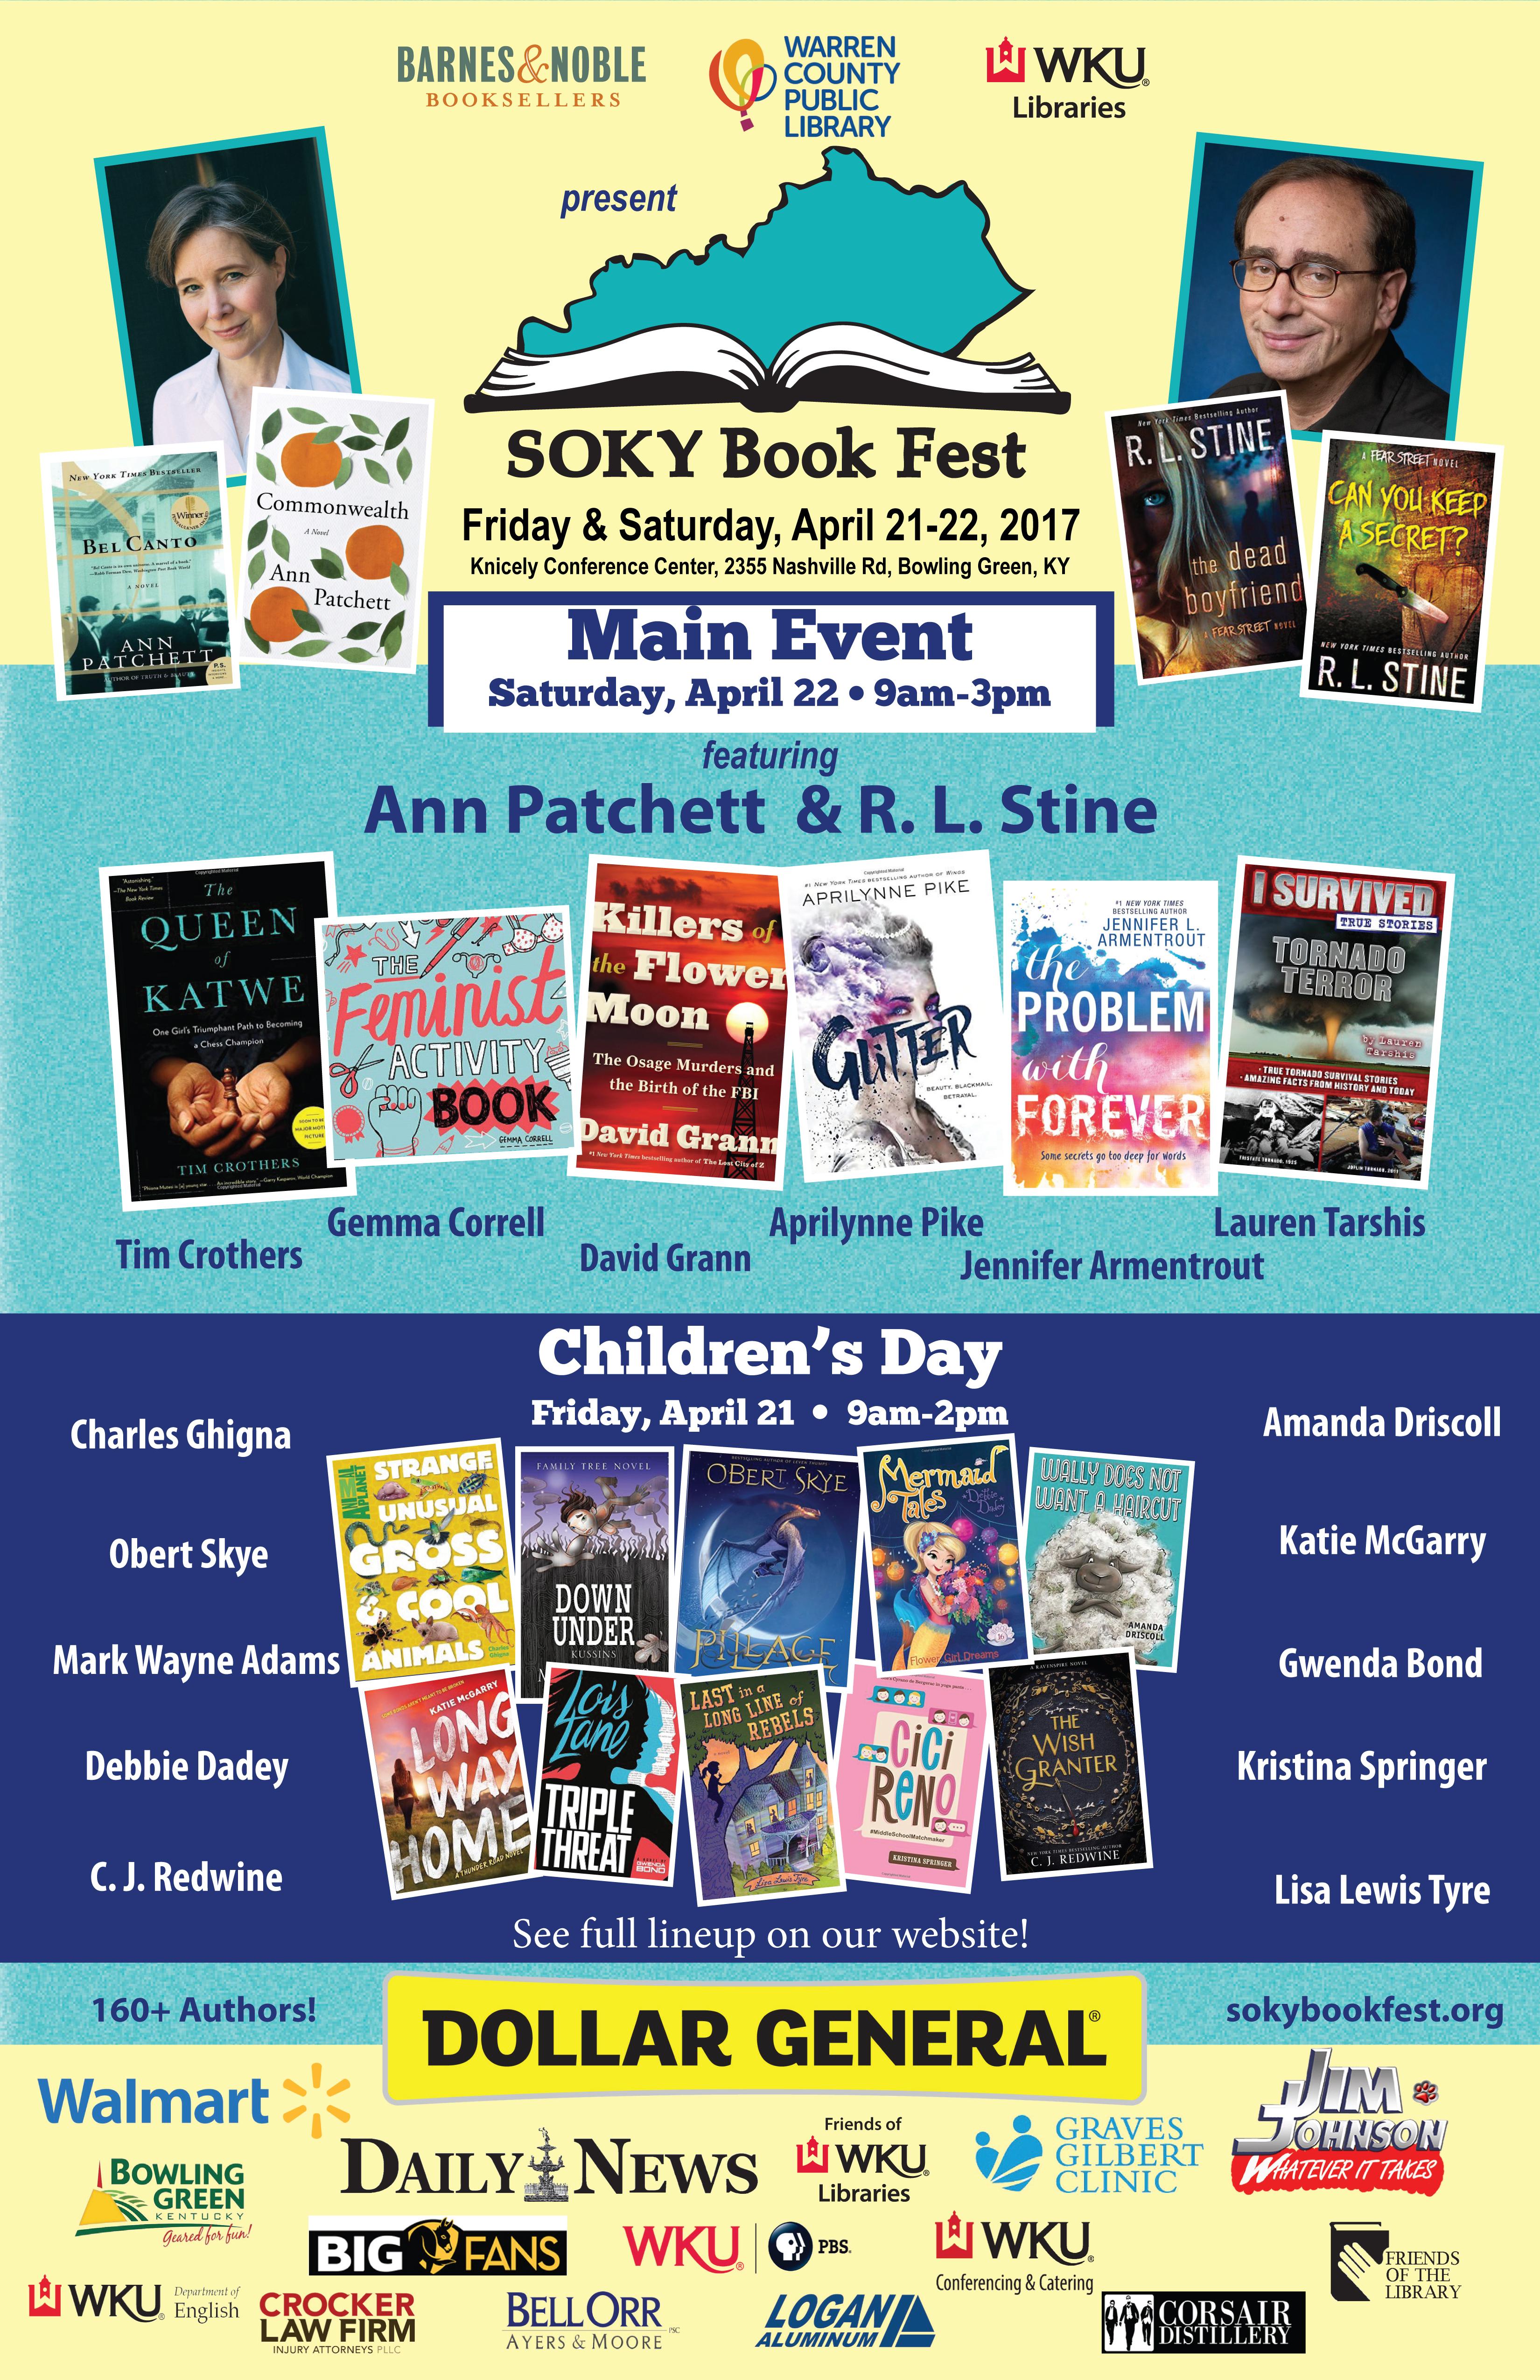 SOKY Bookfest 2017 Poster